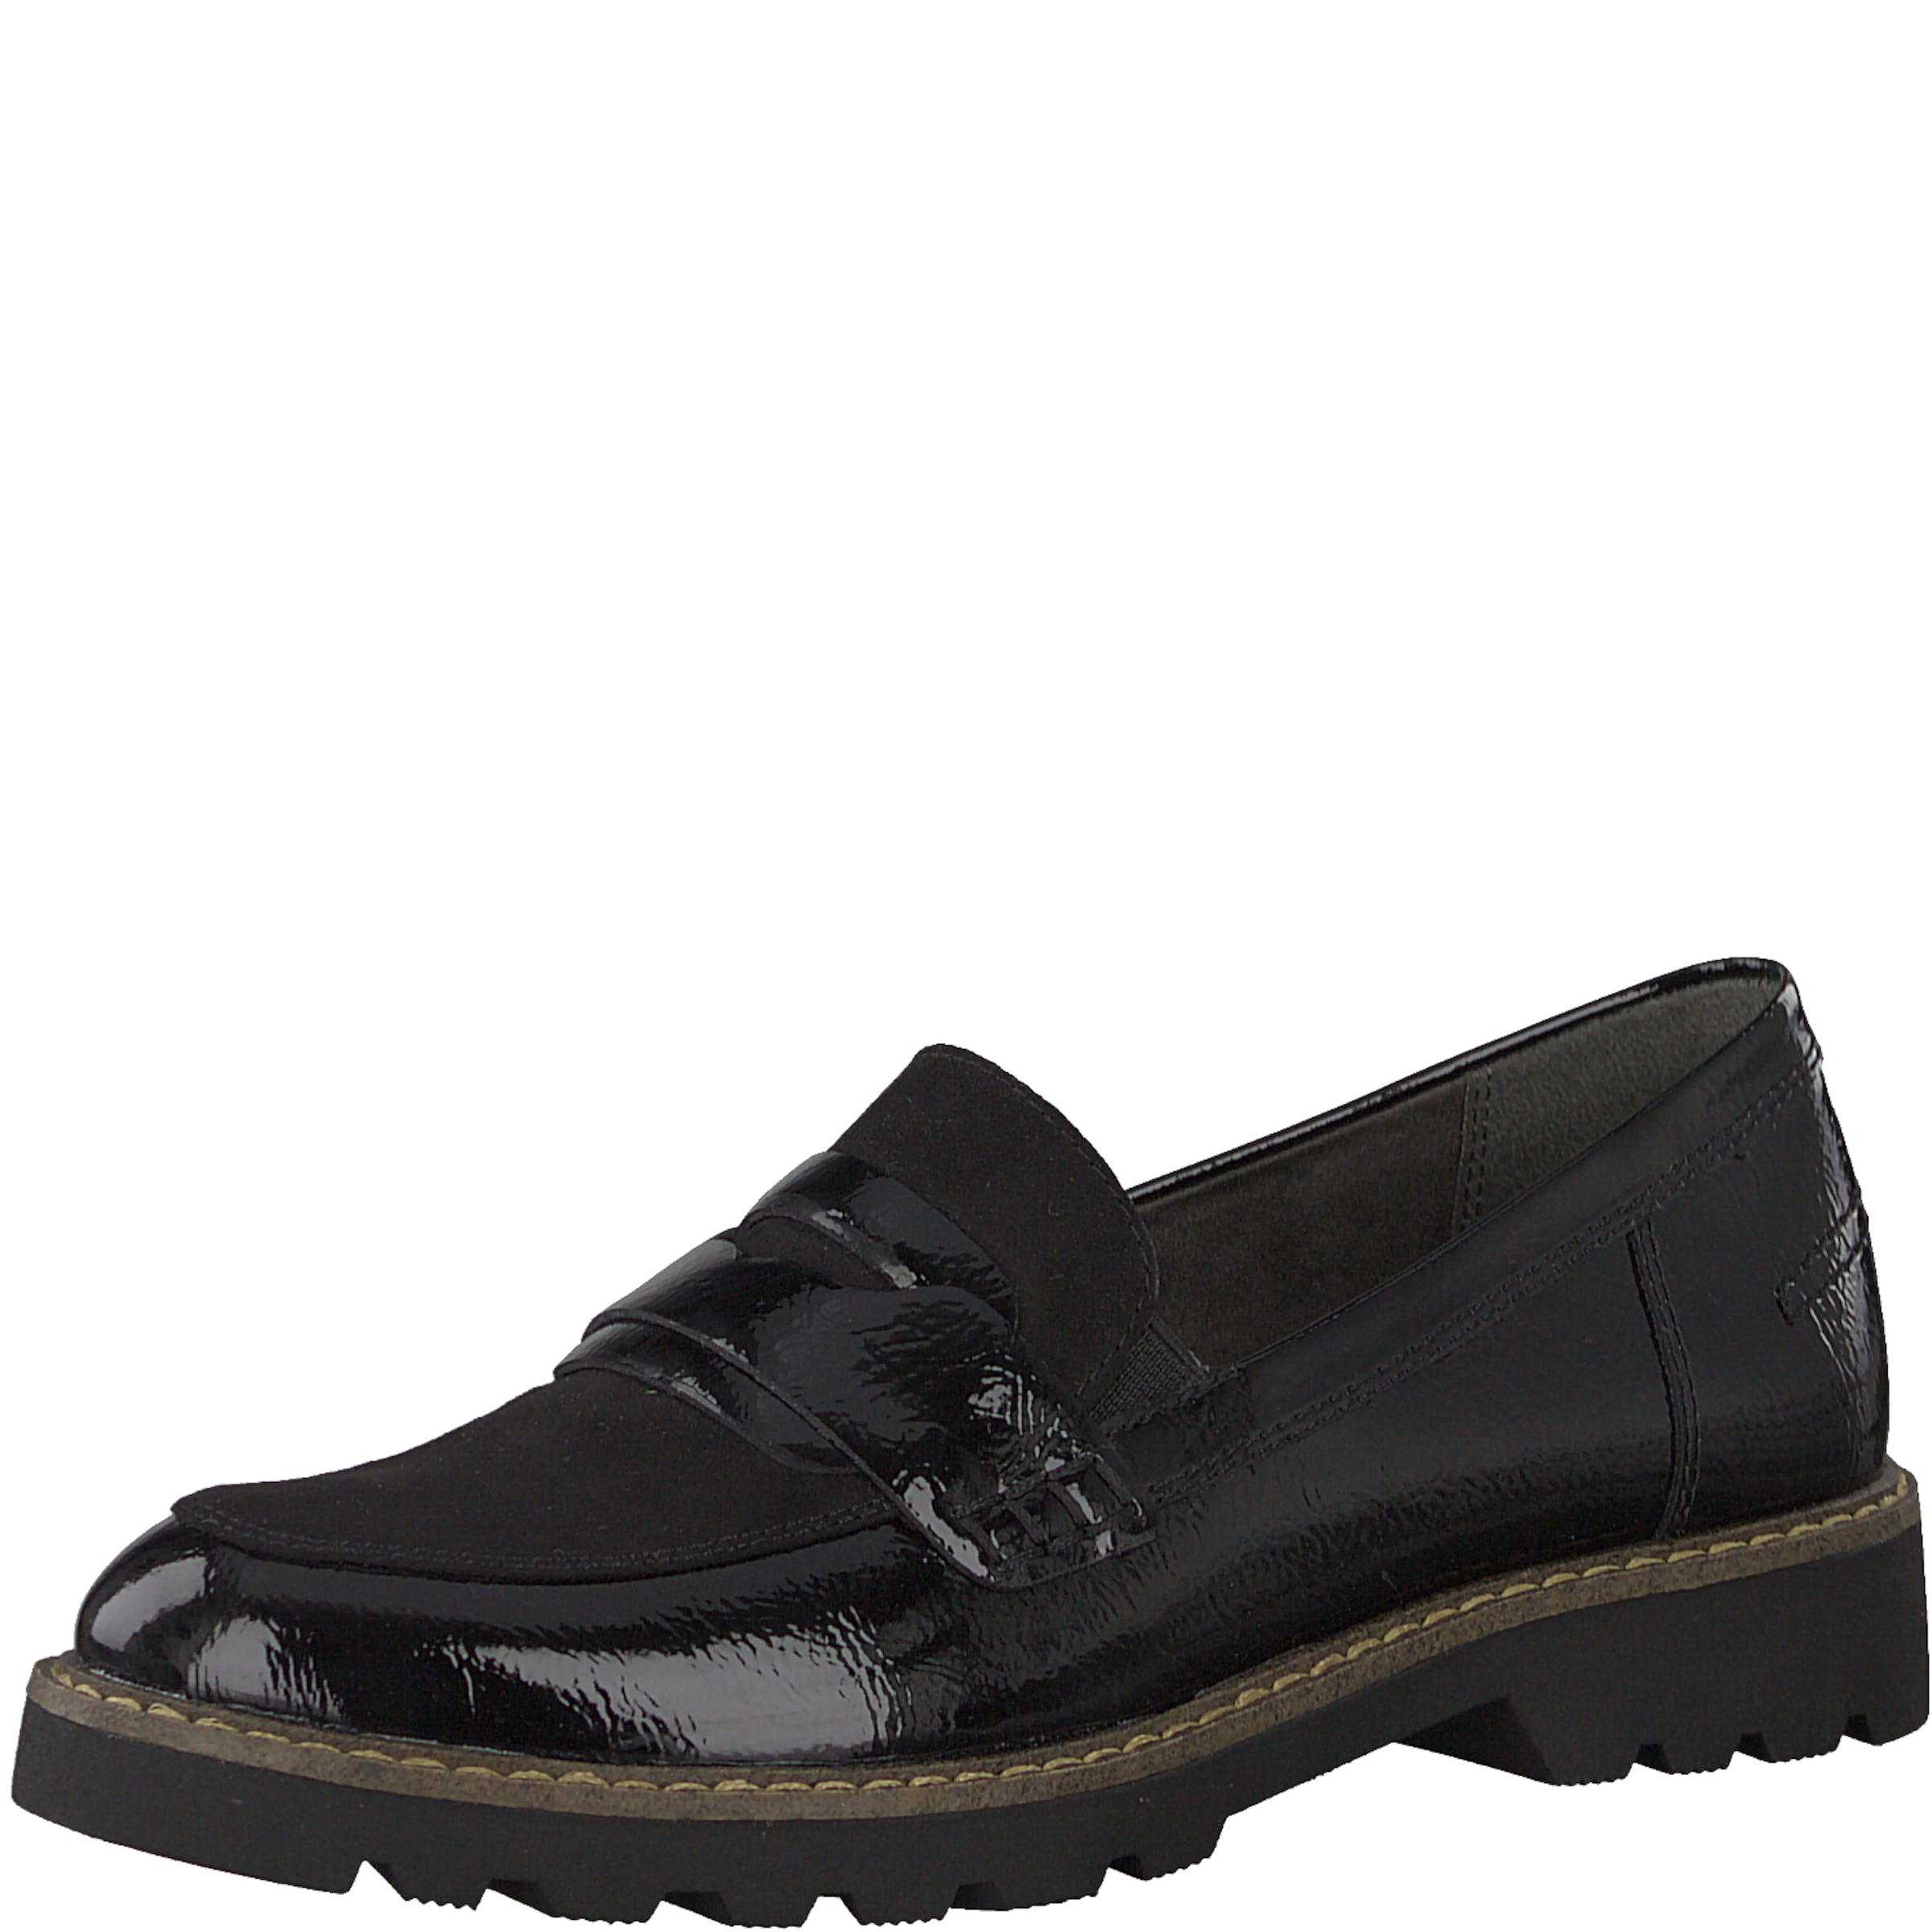 TAMARIS Loafer Loafer Loafer Verschleißfeste billige Schuhe Hohe Qualität b93f28